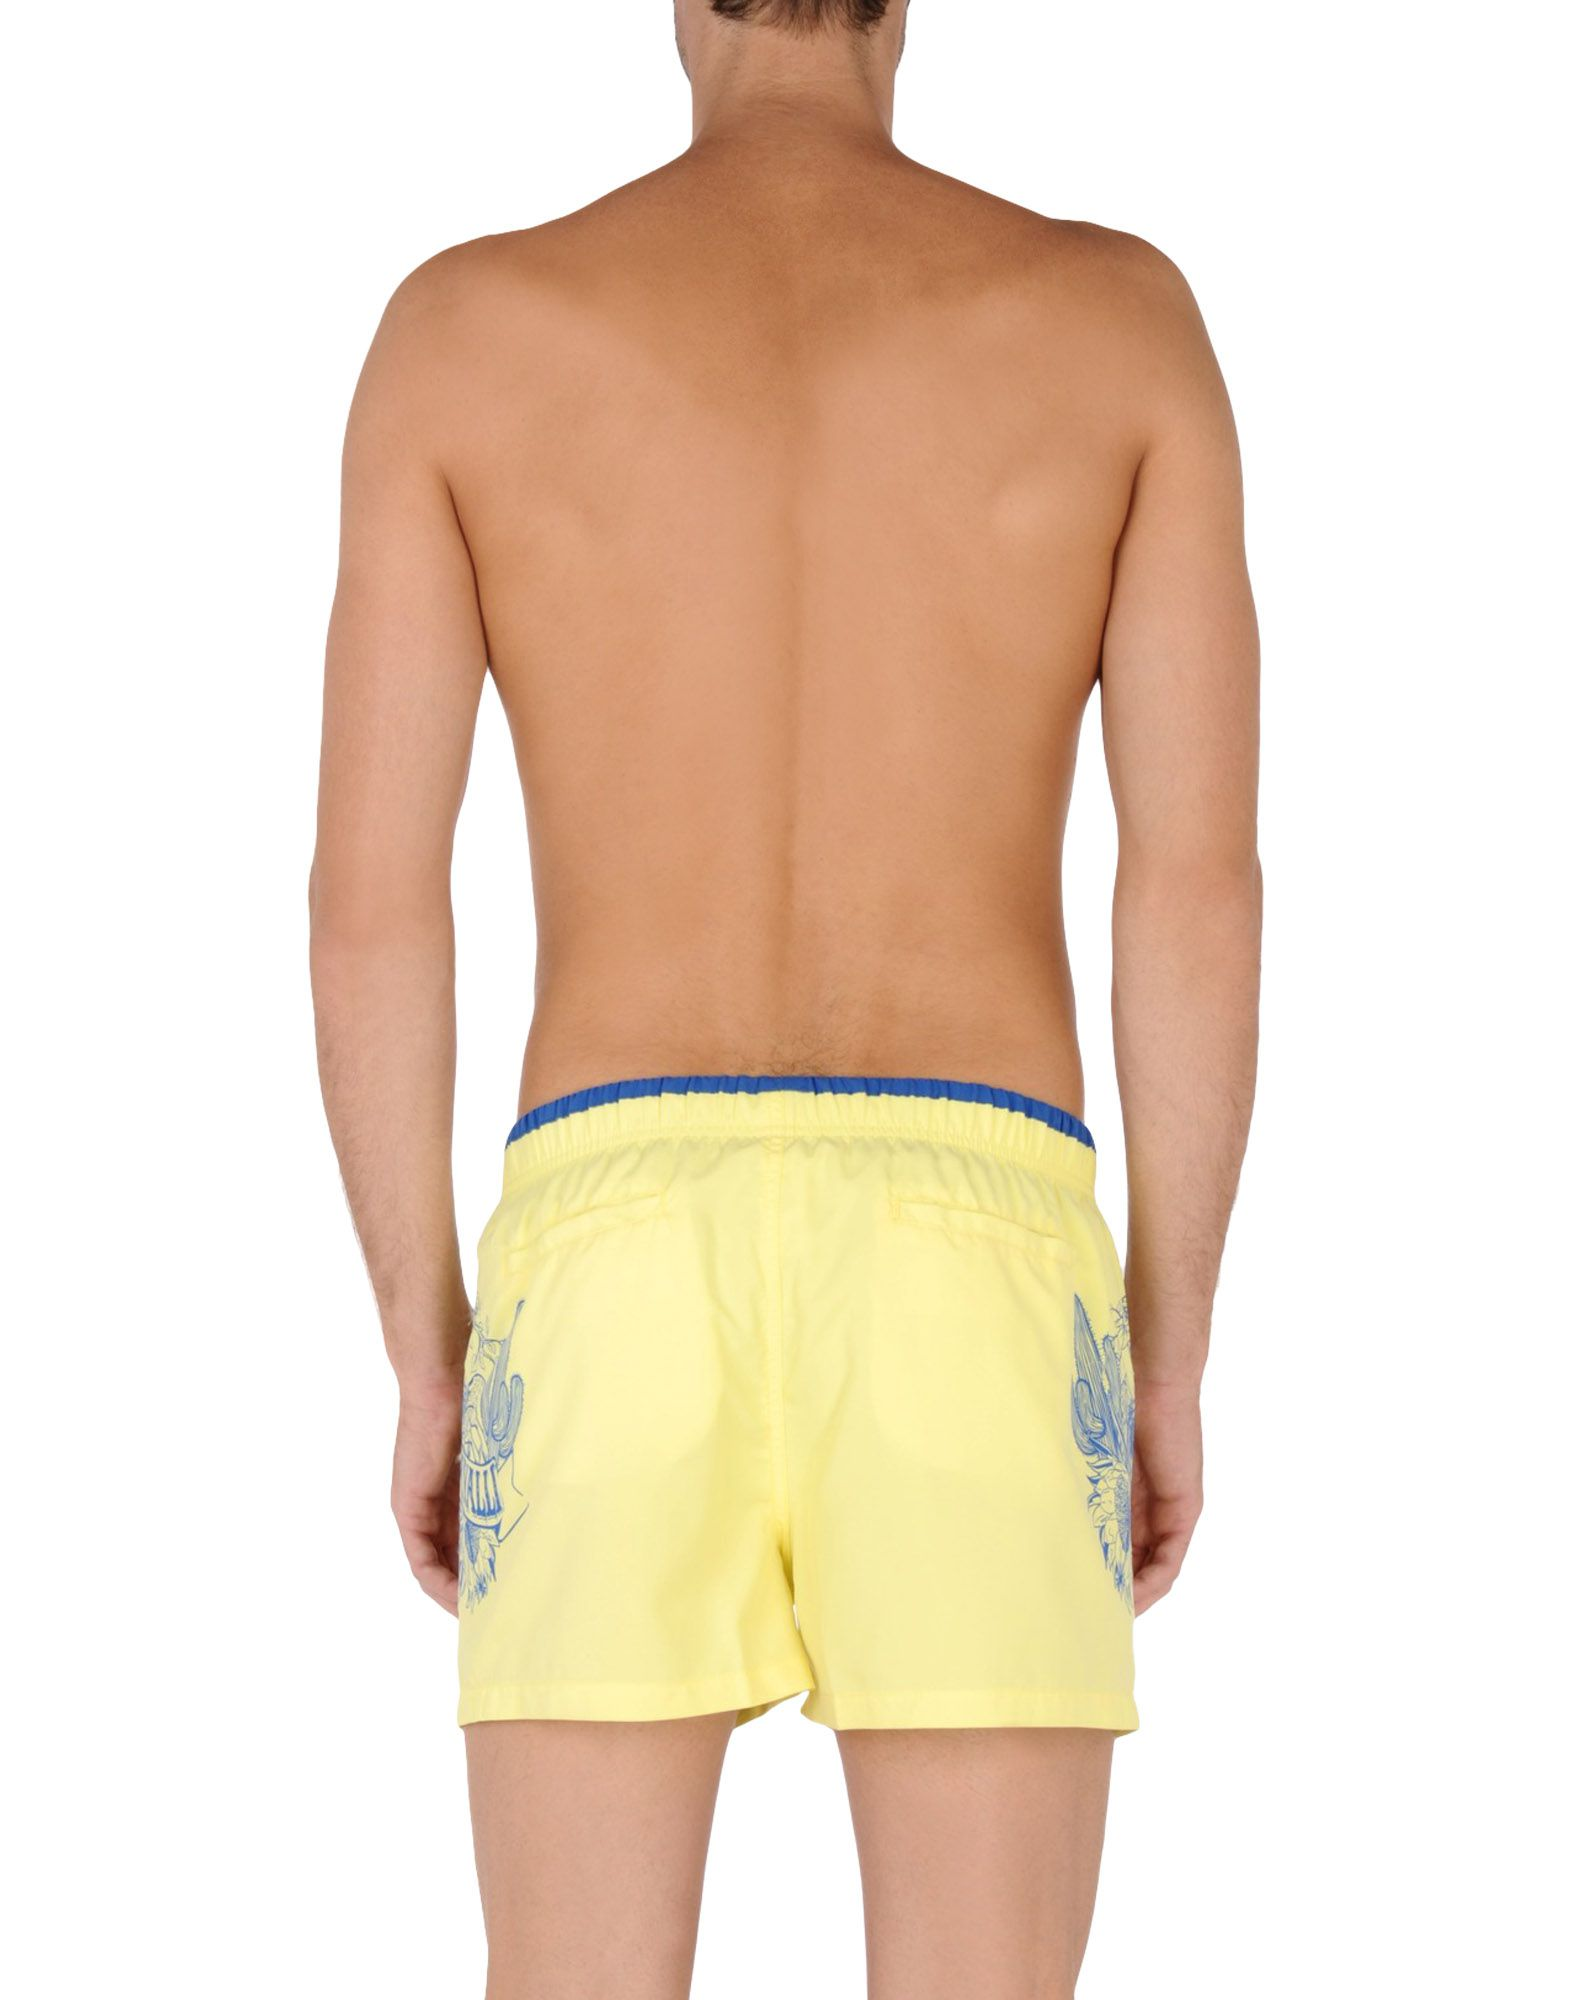 Boxer Mare Just Cavalli Beachwear Uomo - 47206197UB 47206197UB - 2db09f